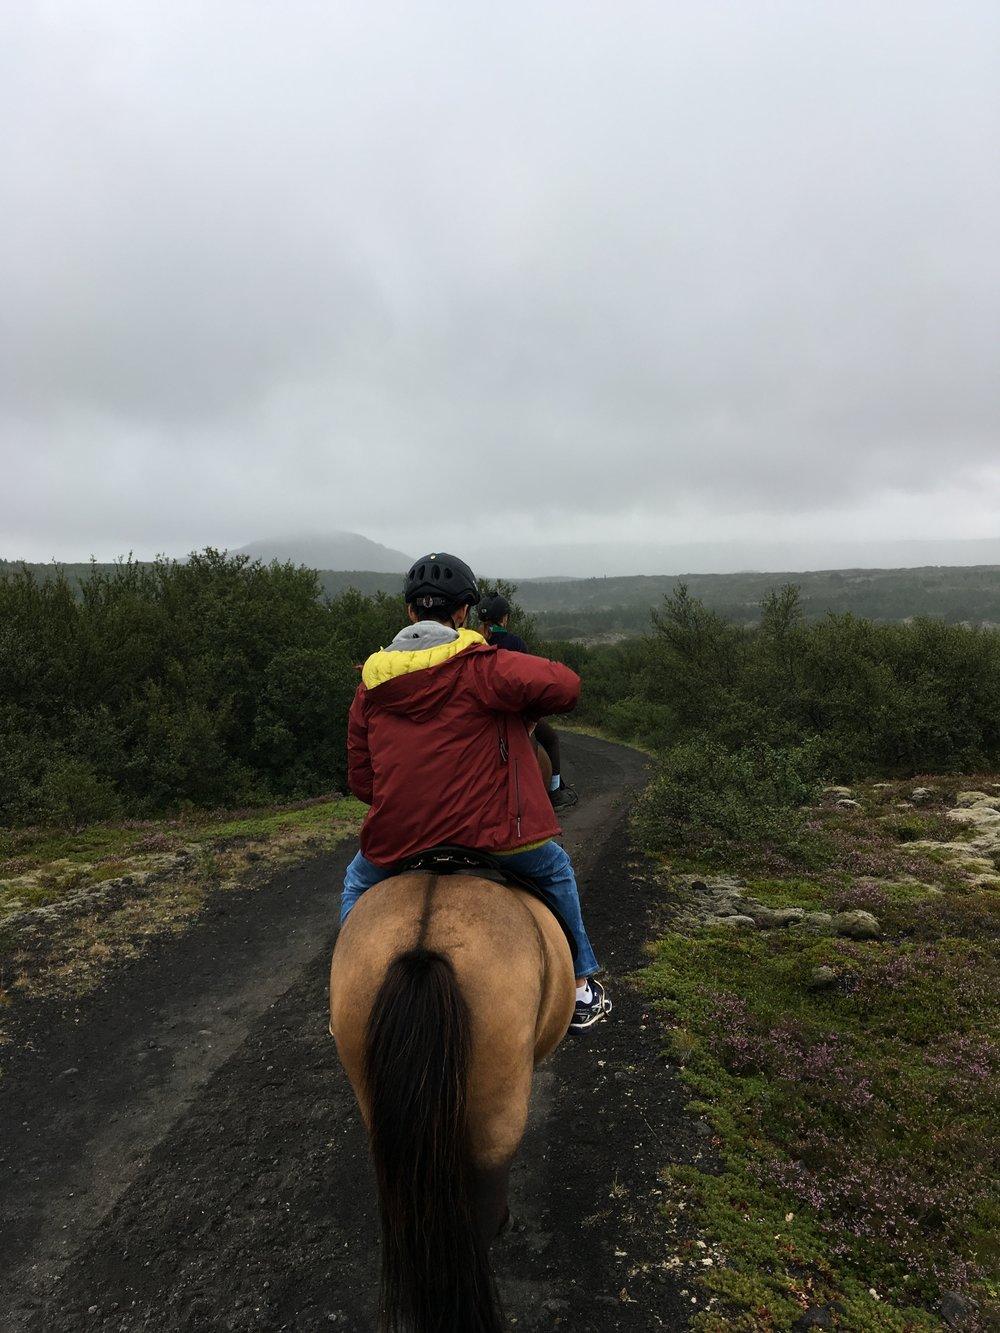 Horsebacking riding outside of Reykjavik, Iceland over a volcanic beach.